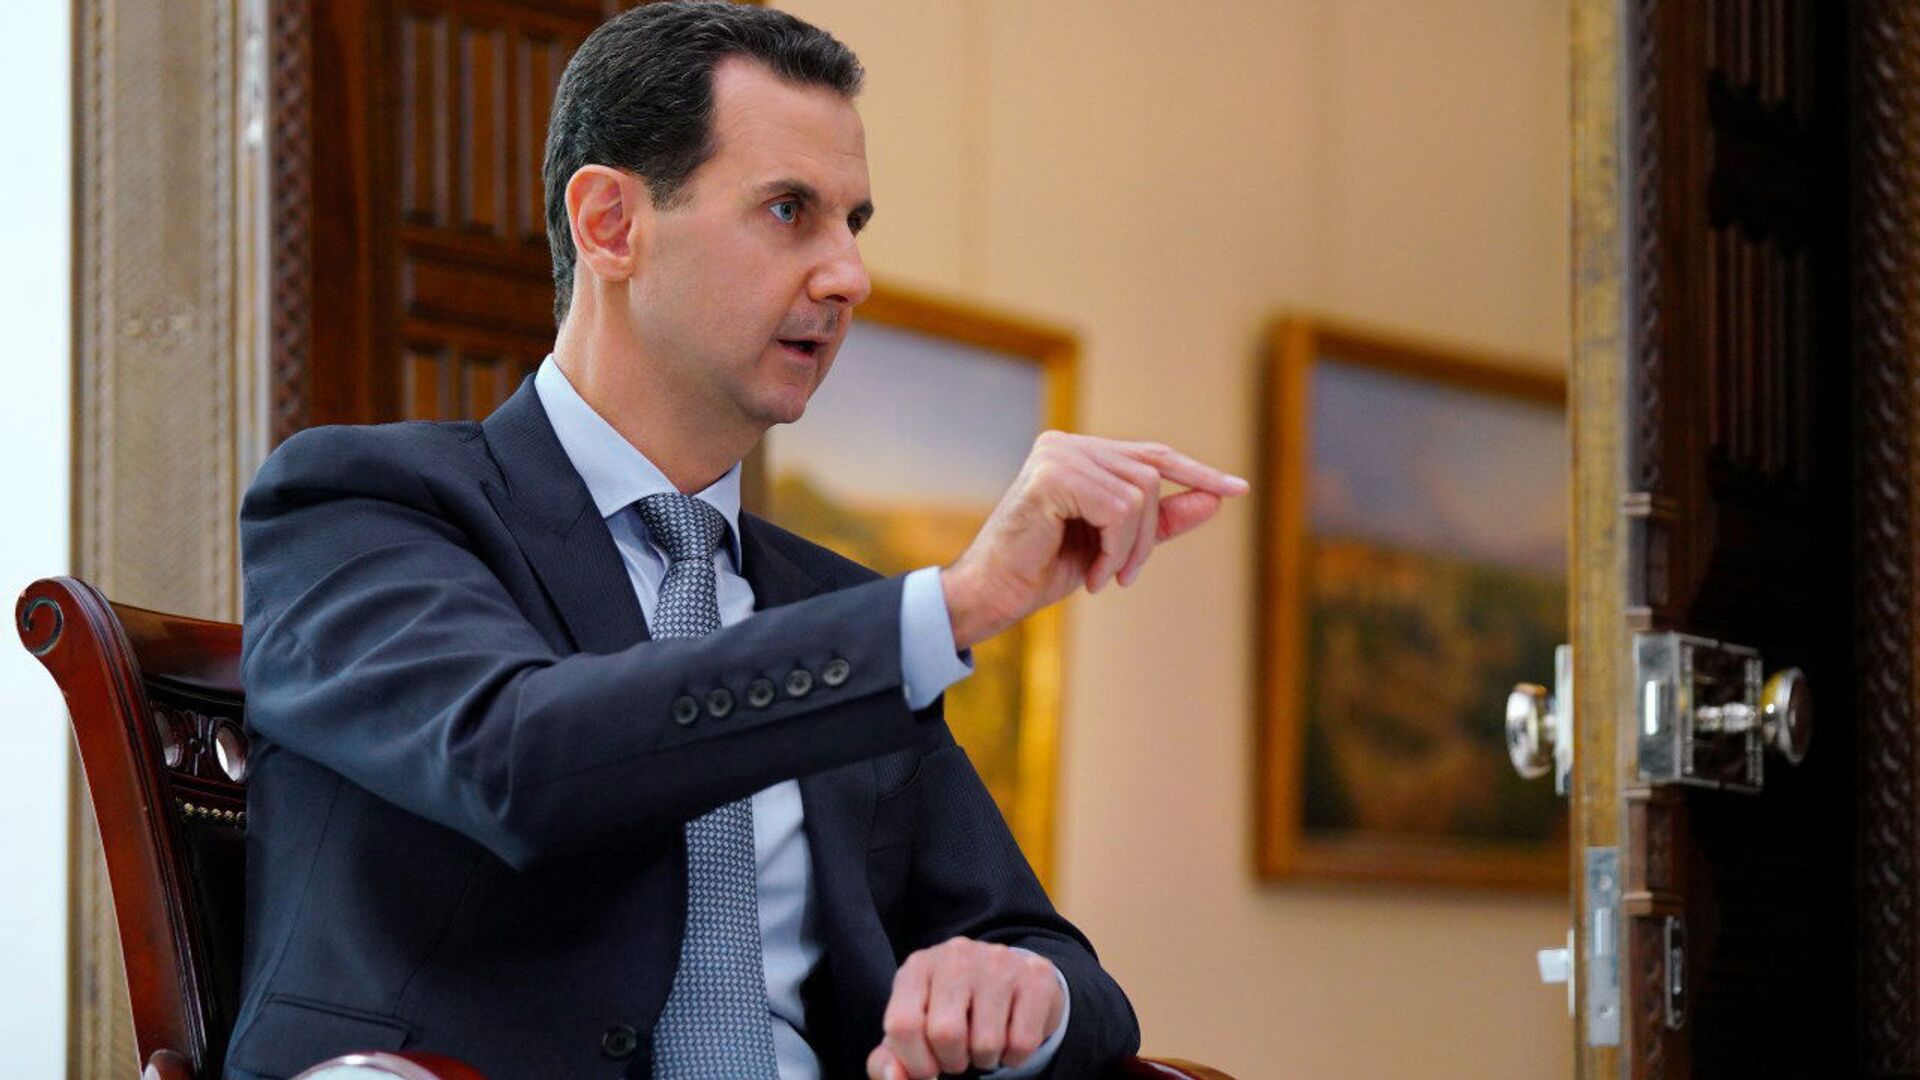 Il presidente siriano Basah al-Assad - Sputnik Italia, 1920, 26.05.2021